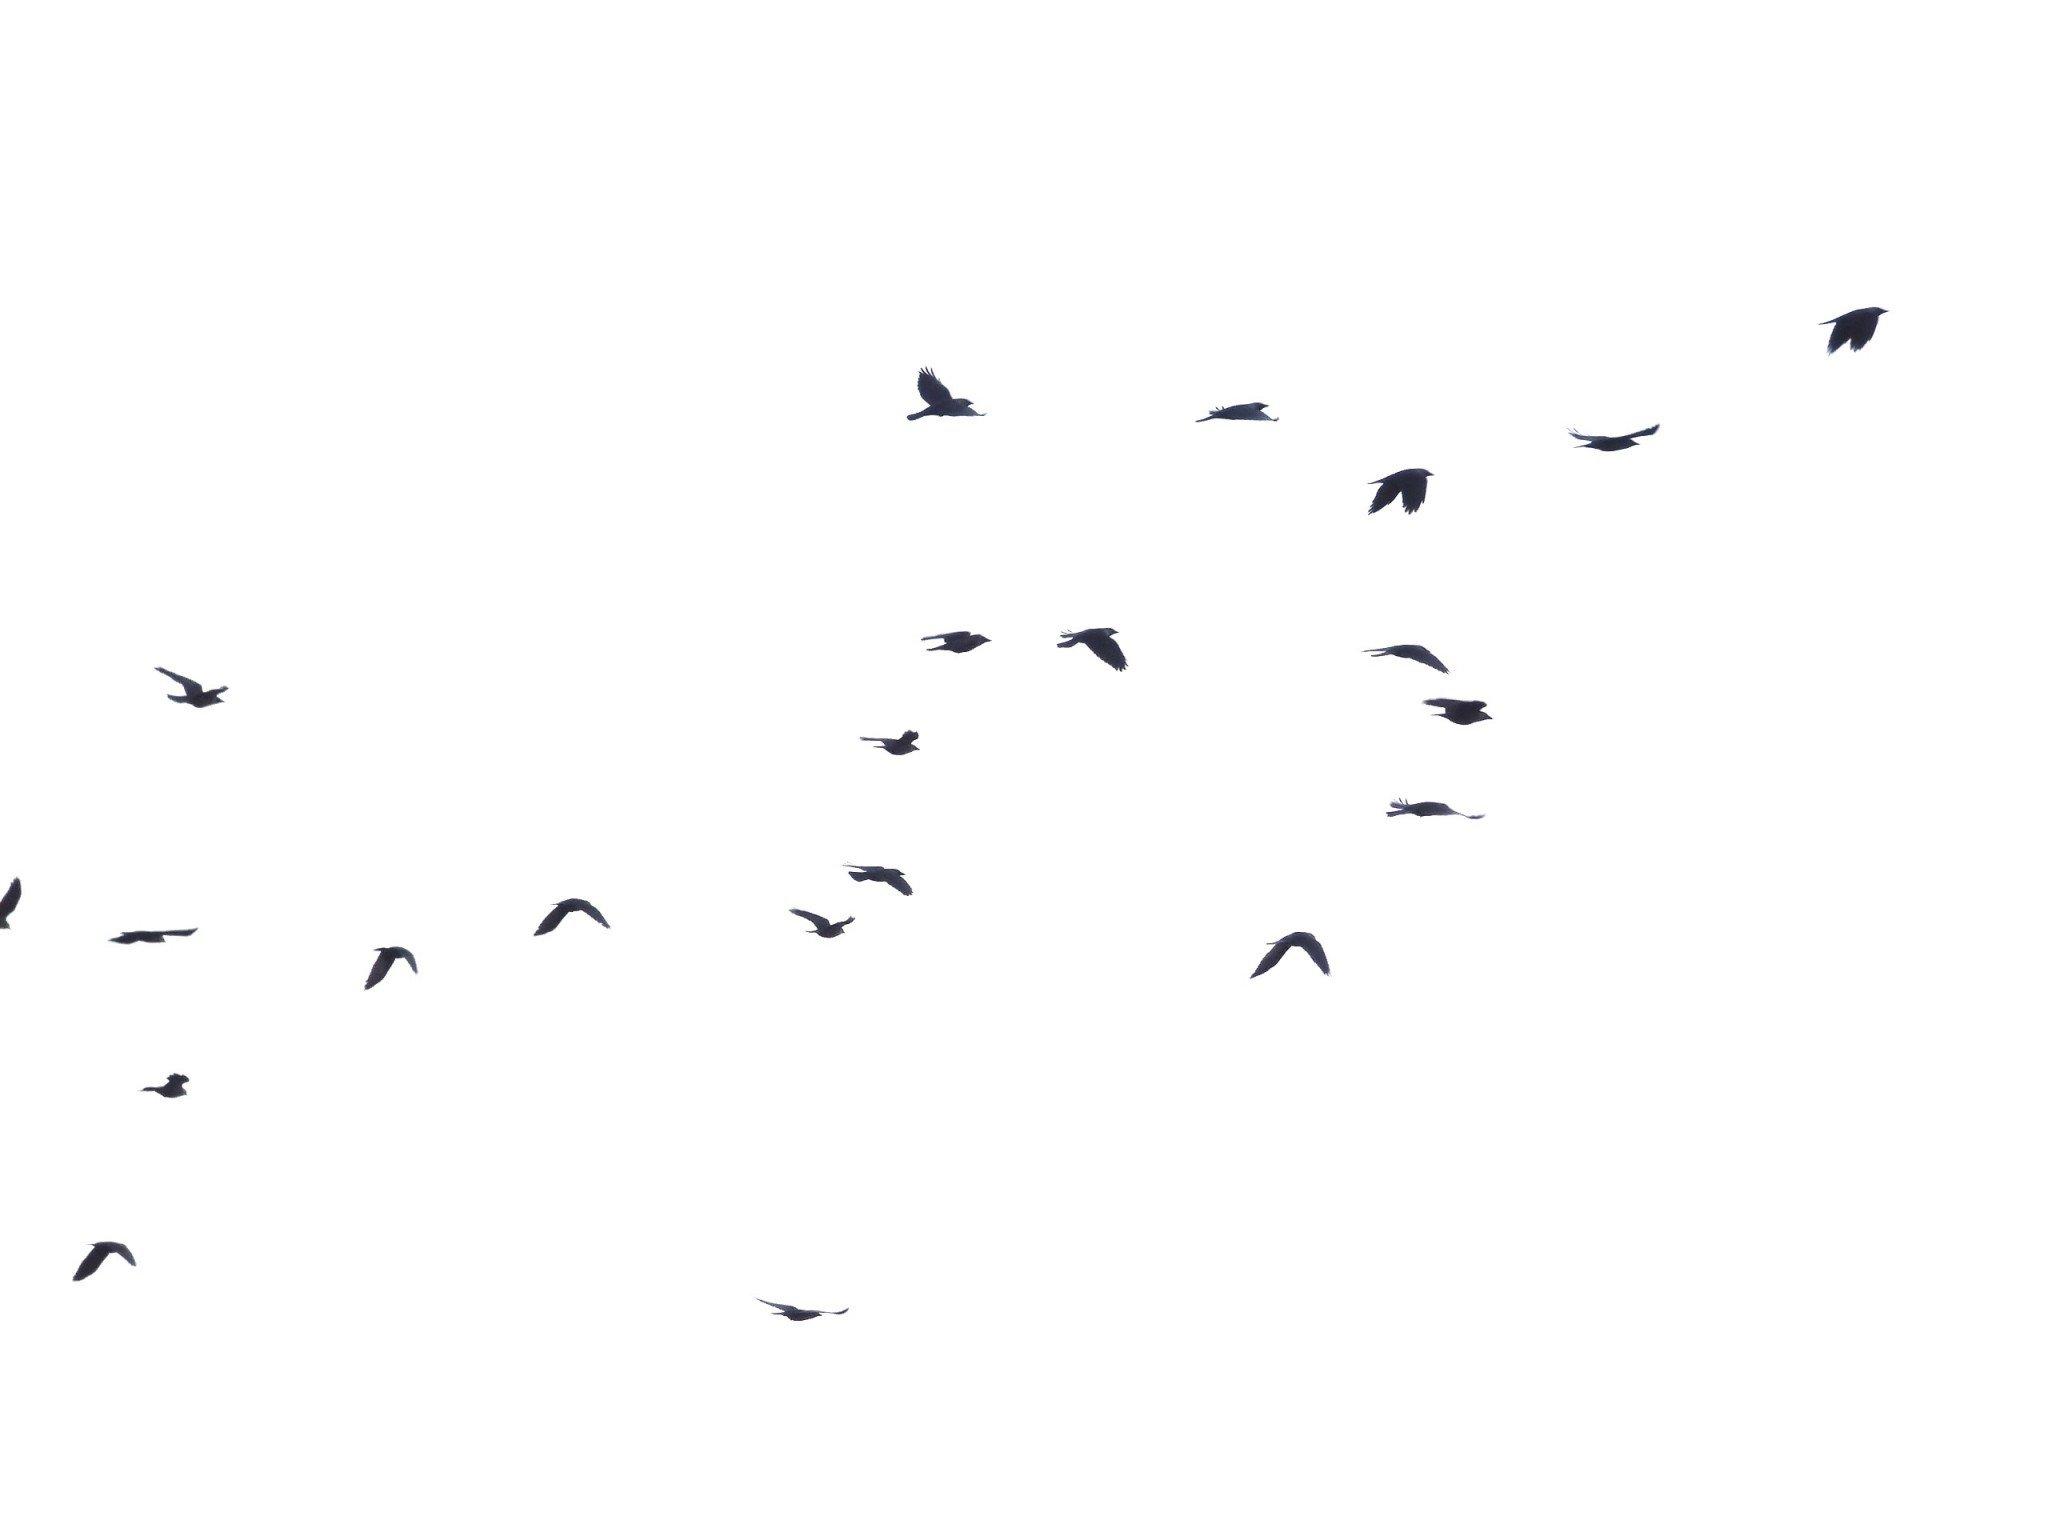 Tallinna linnut